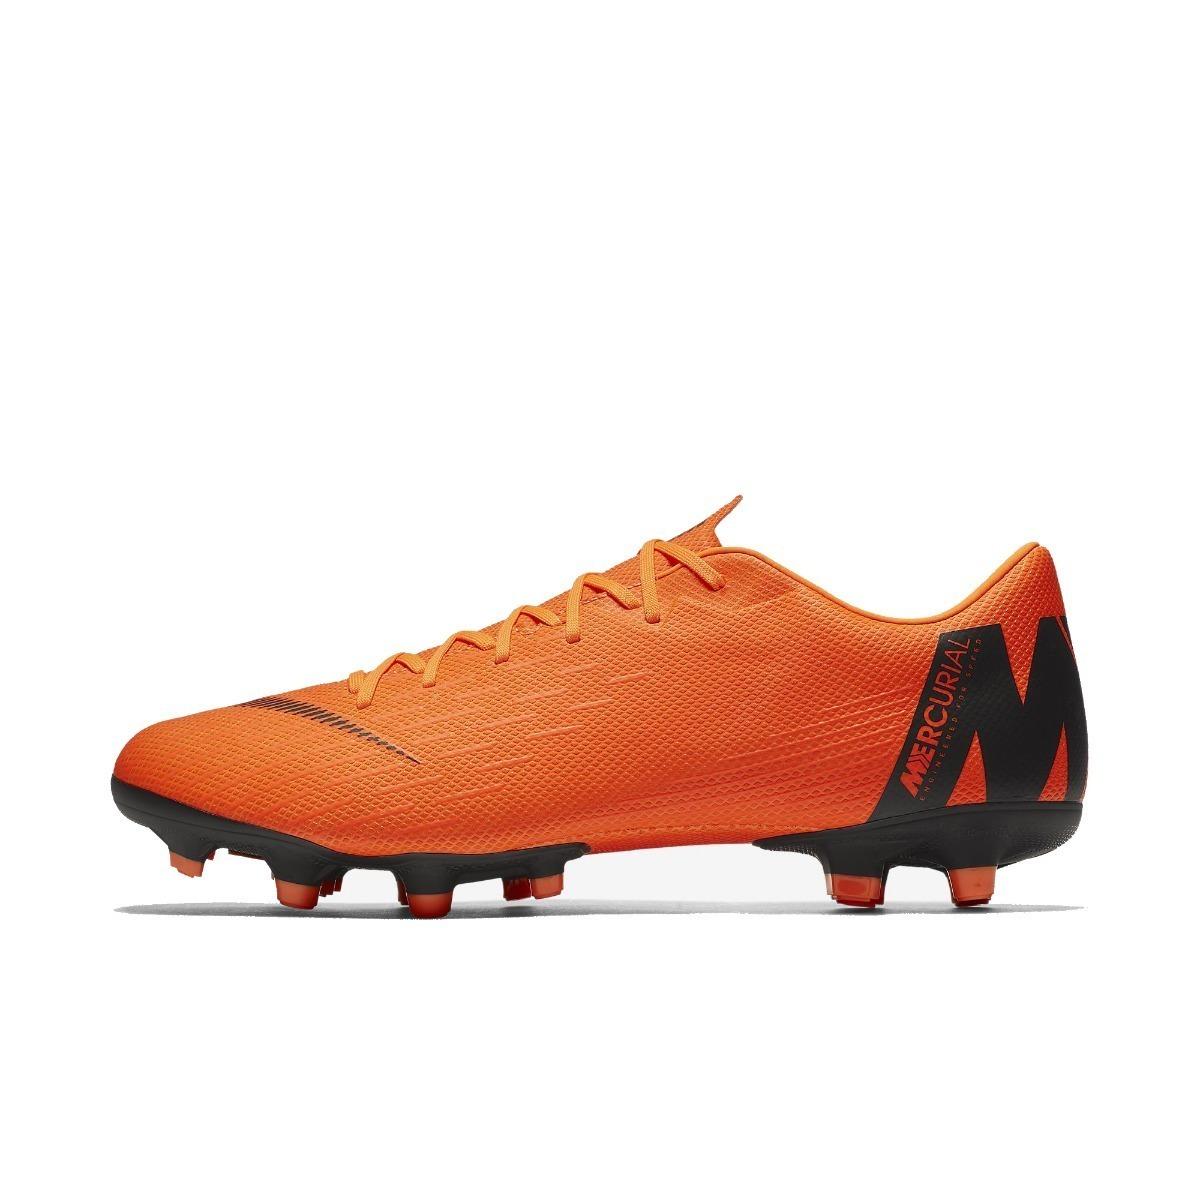 Chuteira Nike Mercurial Vapor 12 Academy Mg Campo - Laranja - R  249 ... 7c60358070bf4